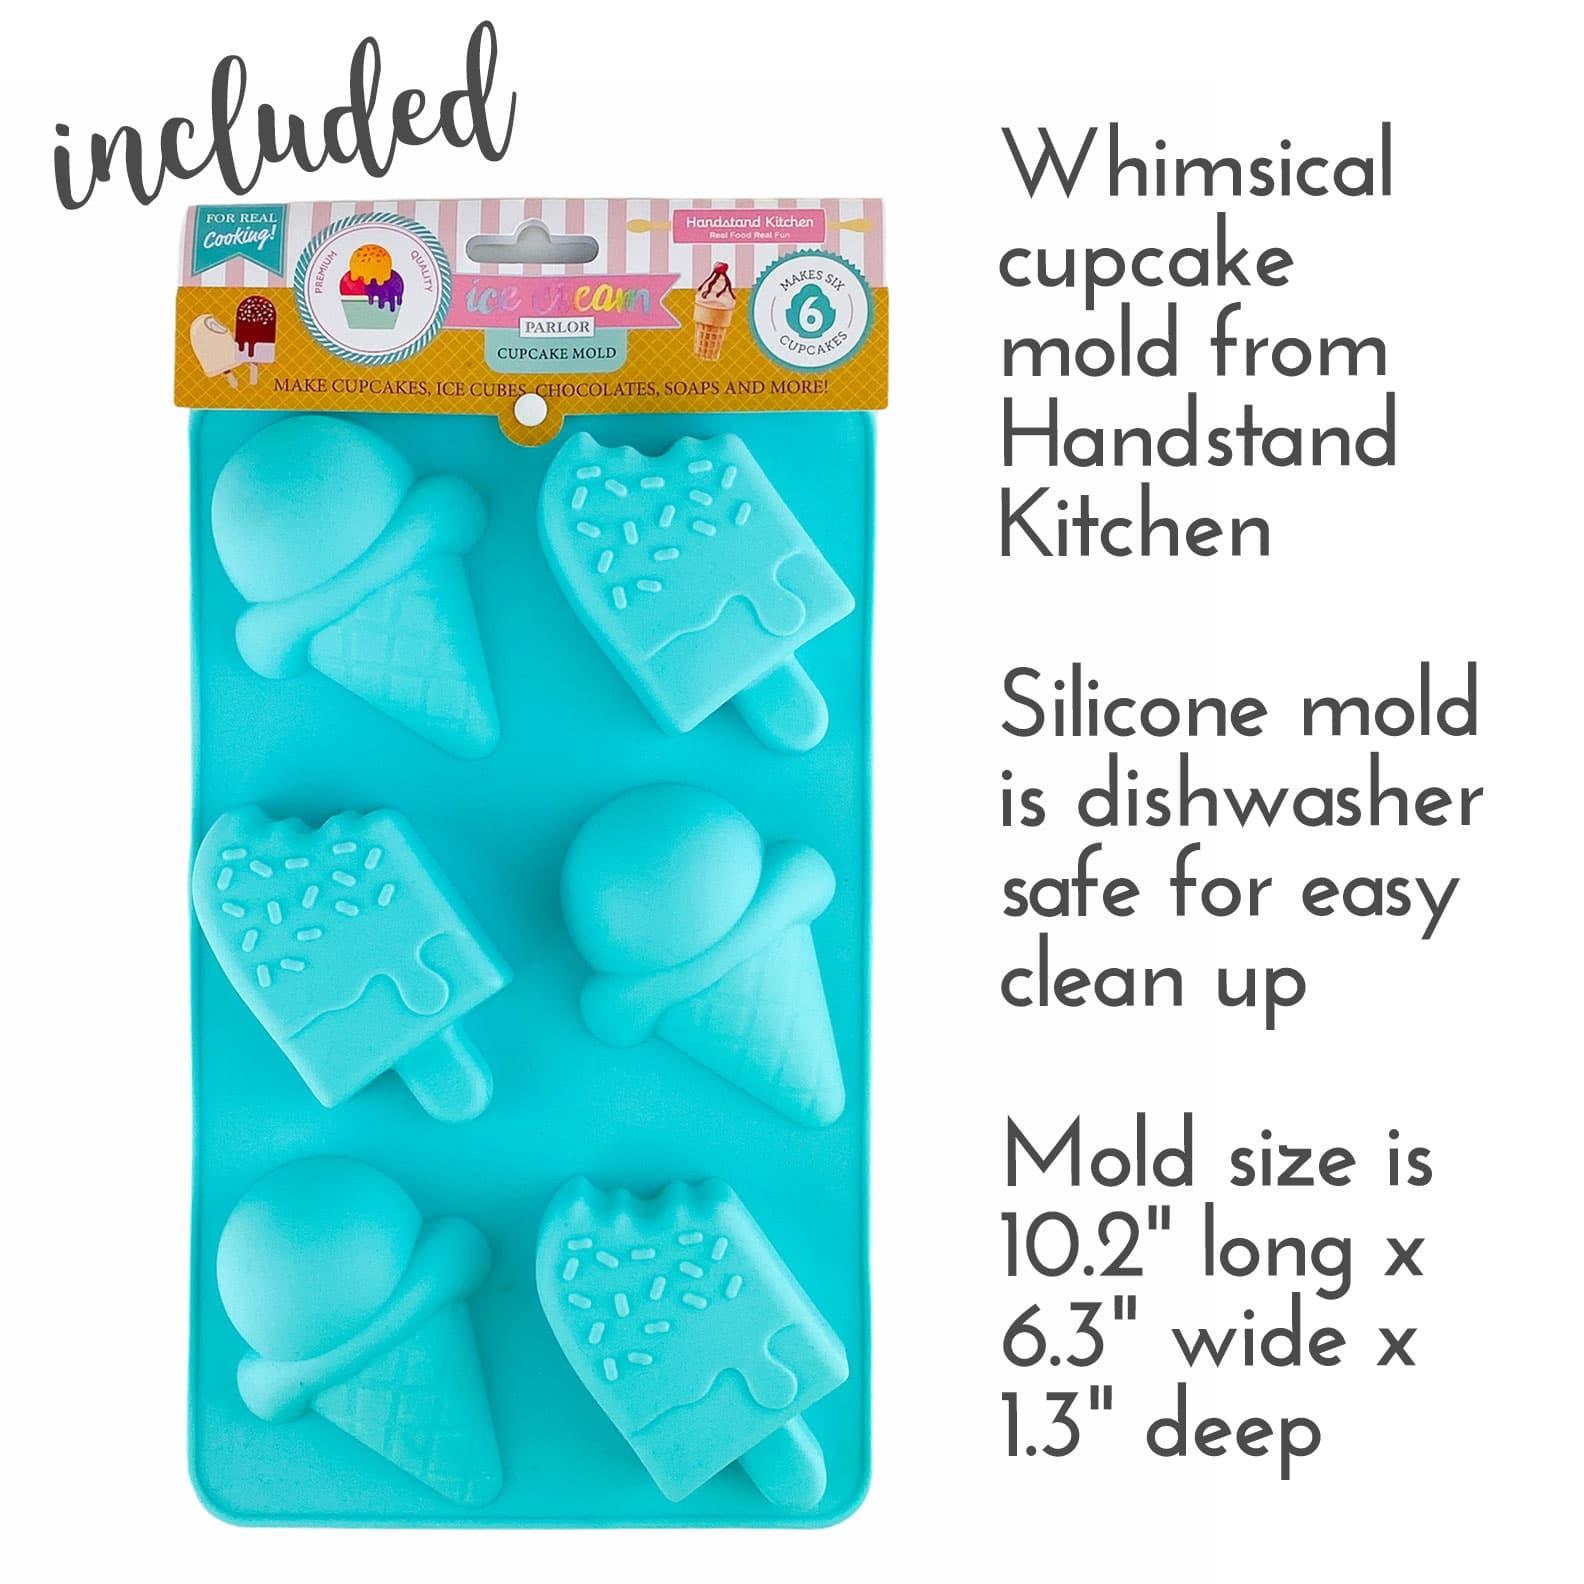 Kate's-Safe-&-Sweet---Popsicle-Baking-Box---Popsicle-Mold